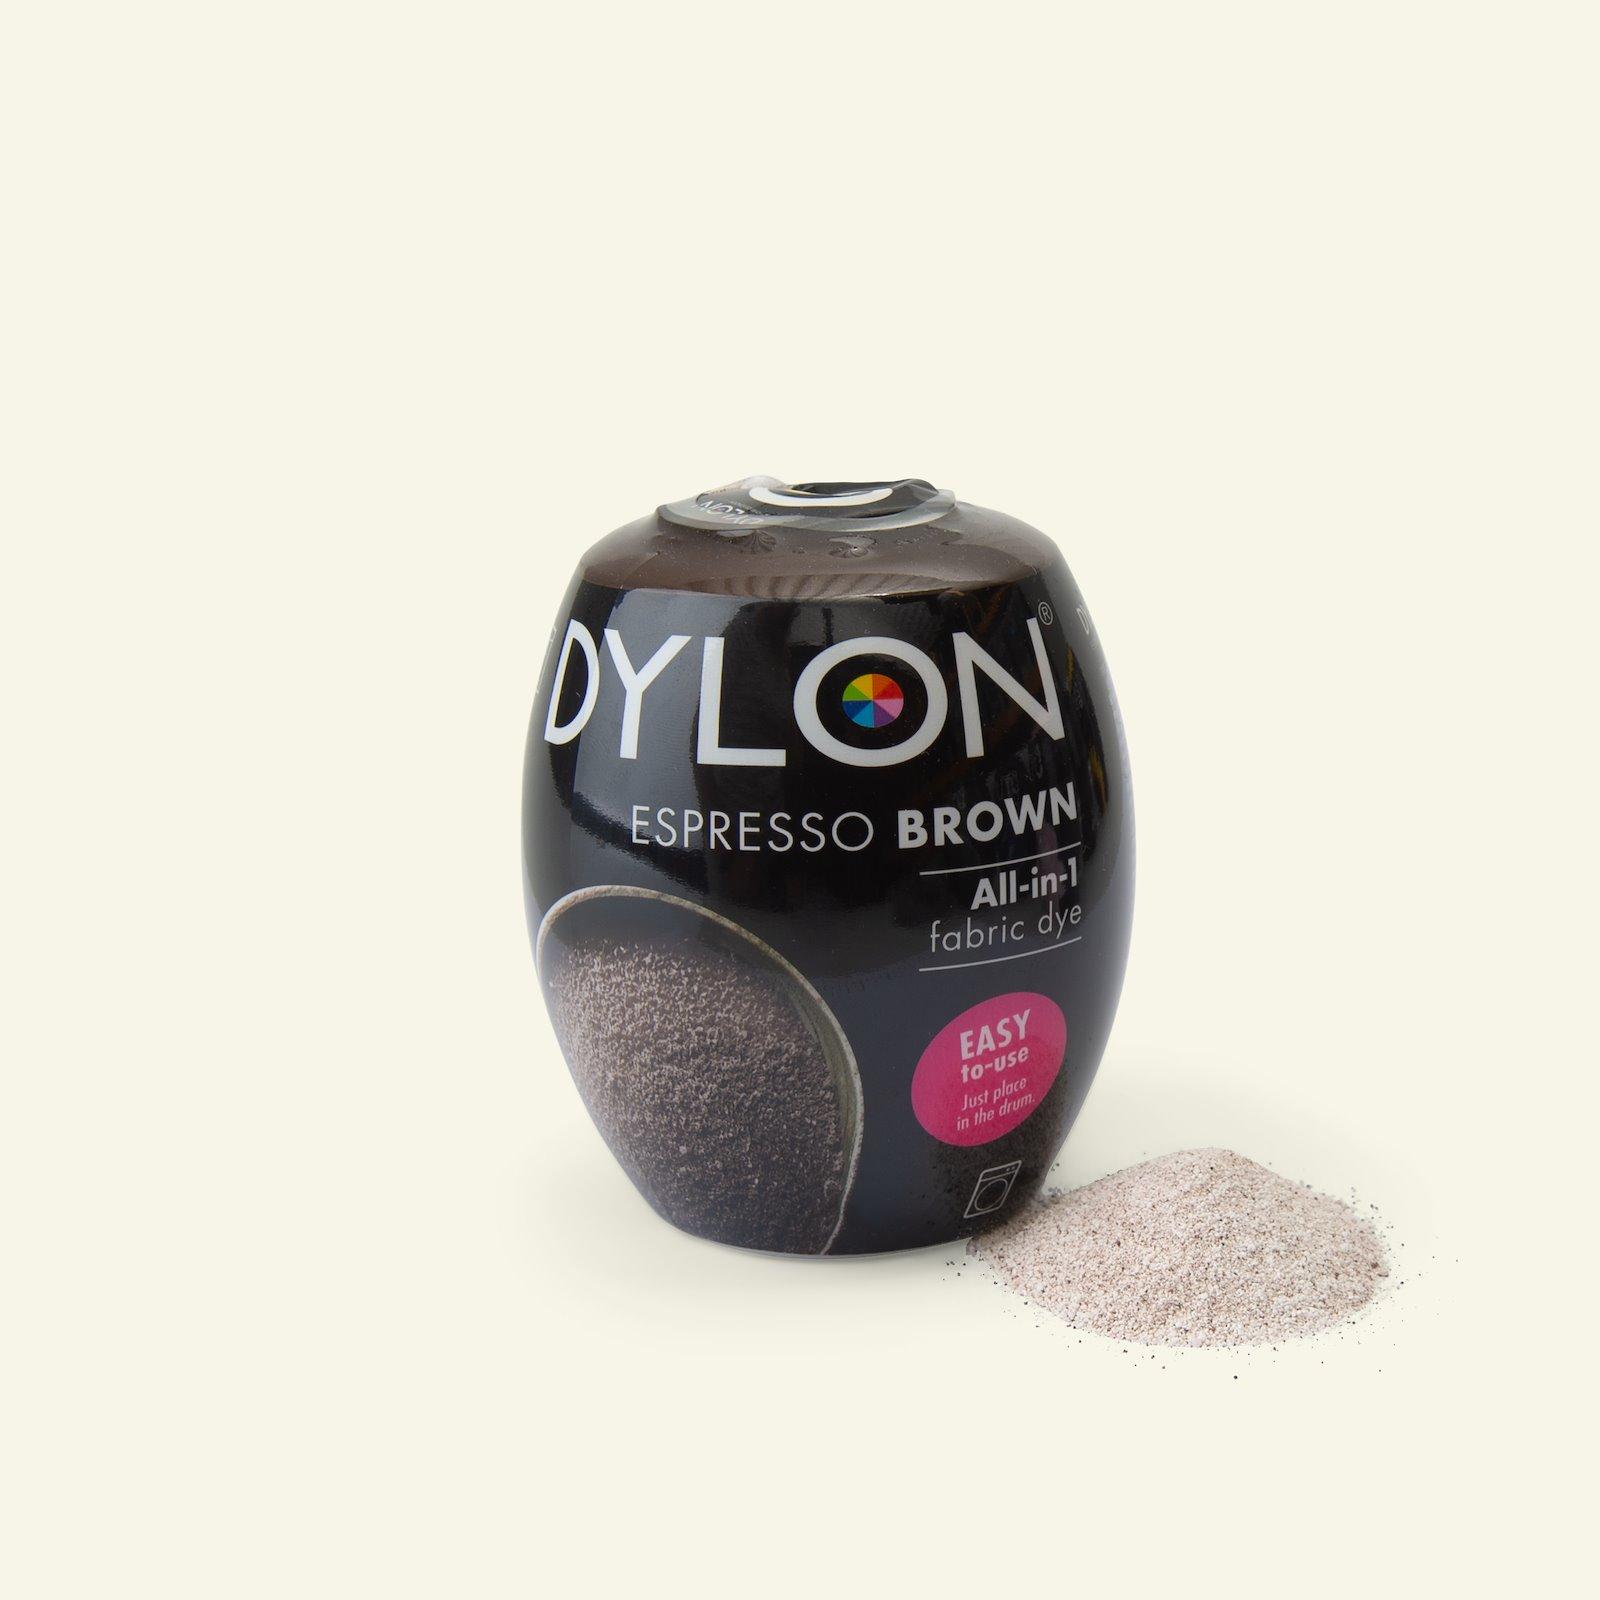 Dylon Maschinenfarbe, Braun 29705_pack